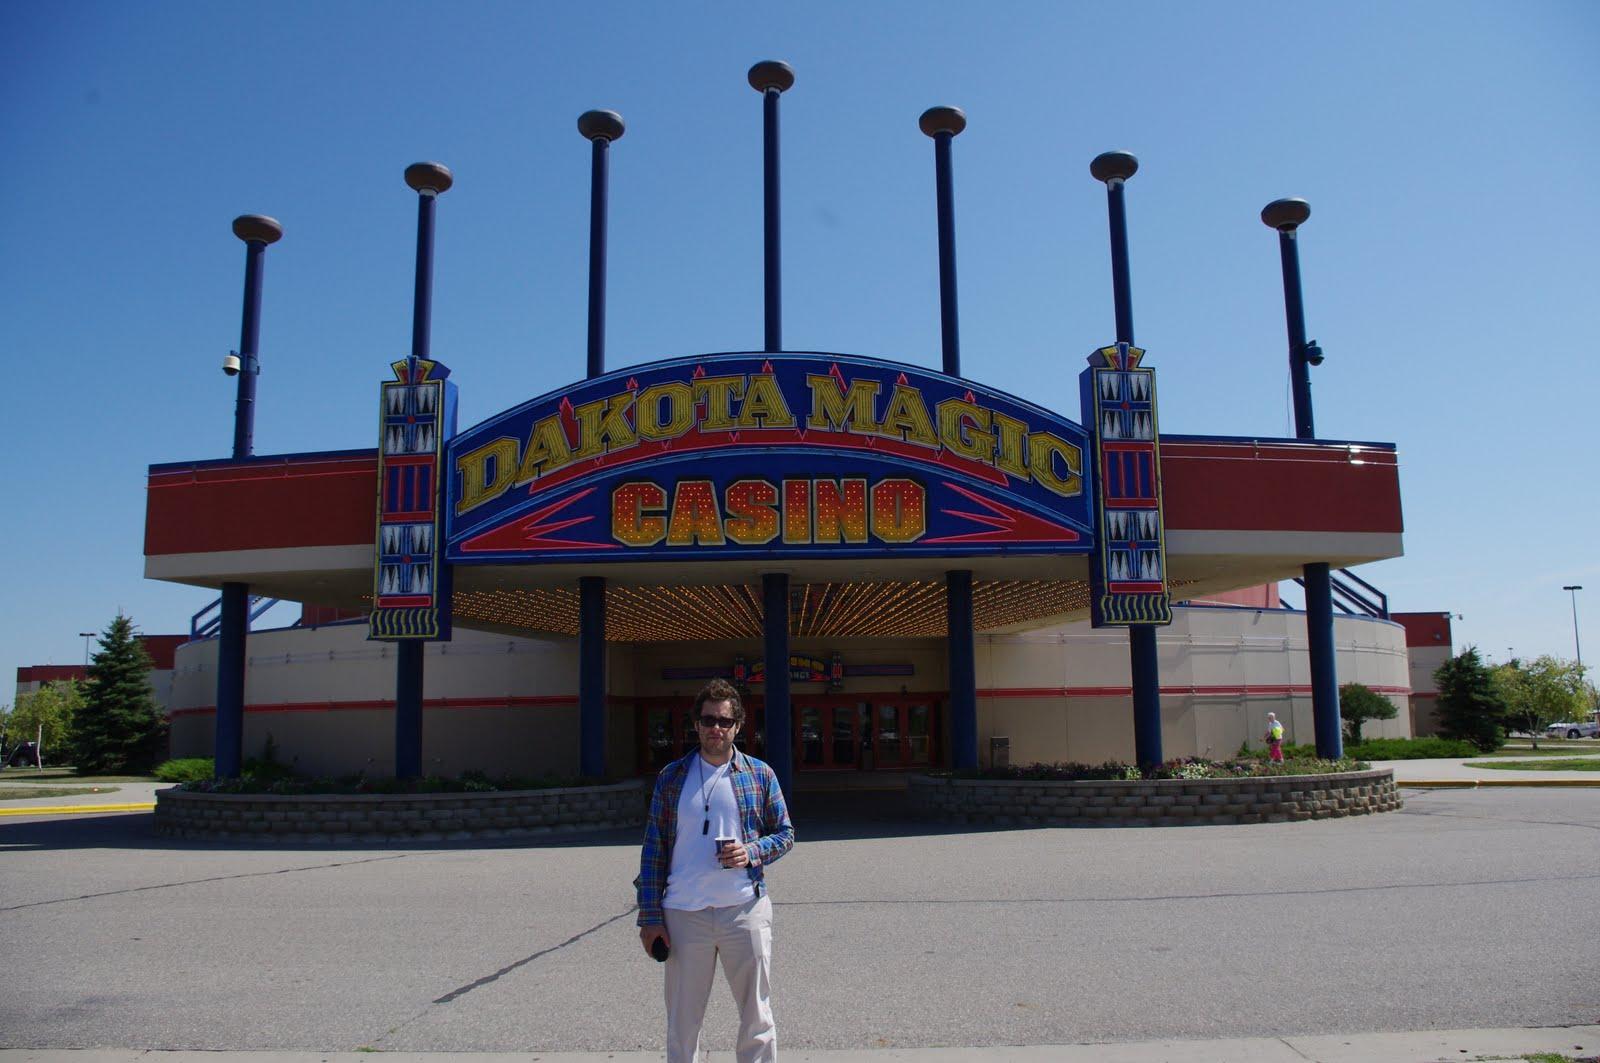 Dakota Magic Casino